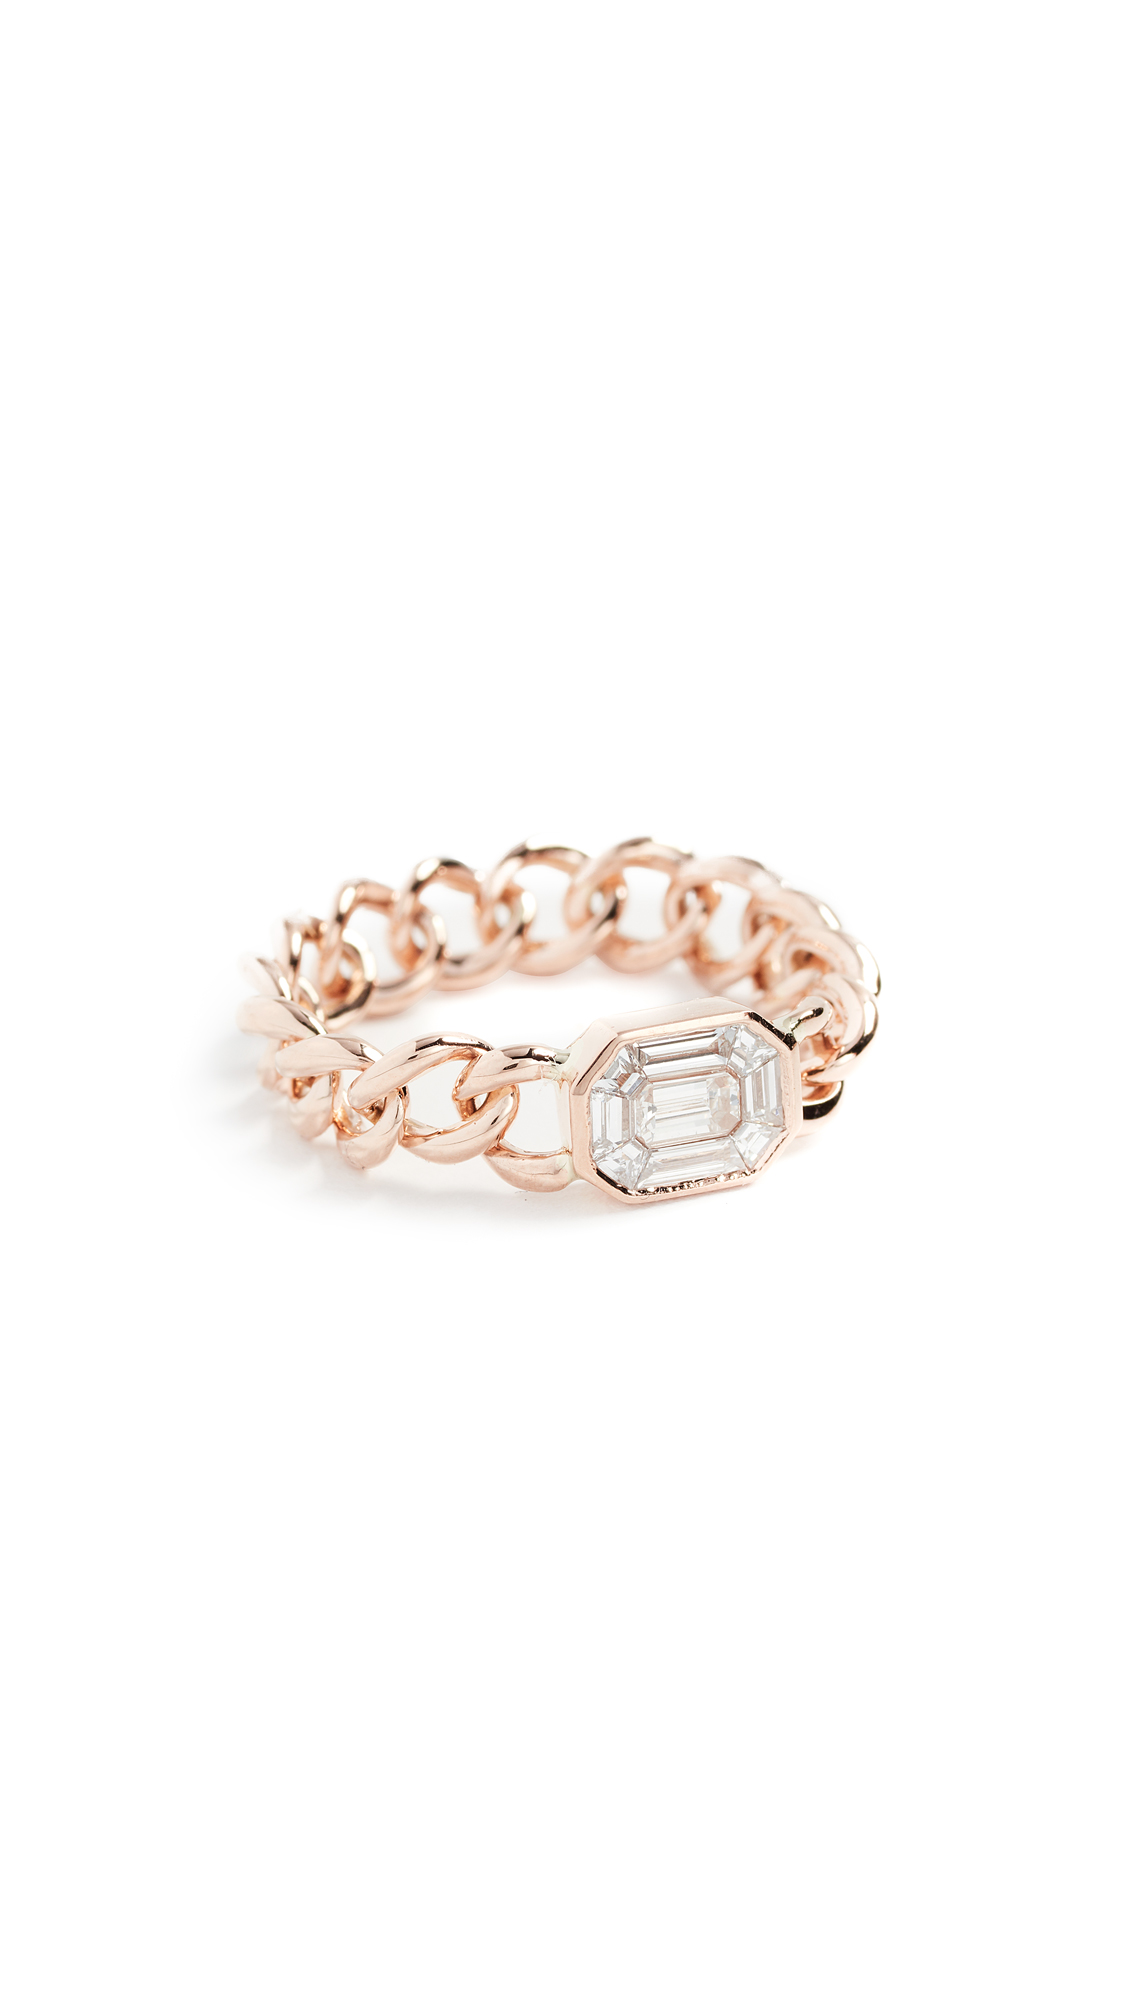 SHAY 18K ILLUSION EMERALD CUT DIAMOND LINK RING